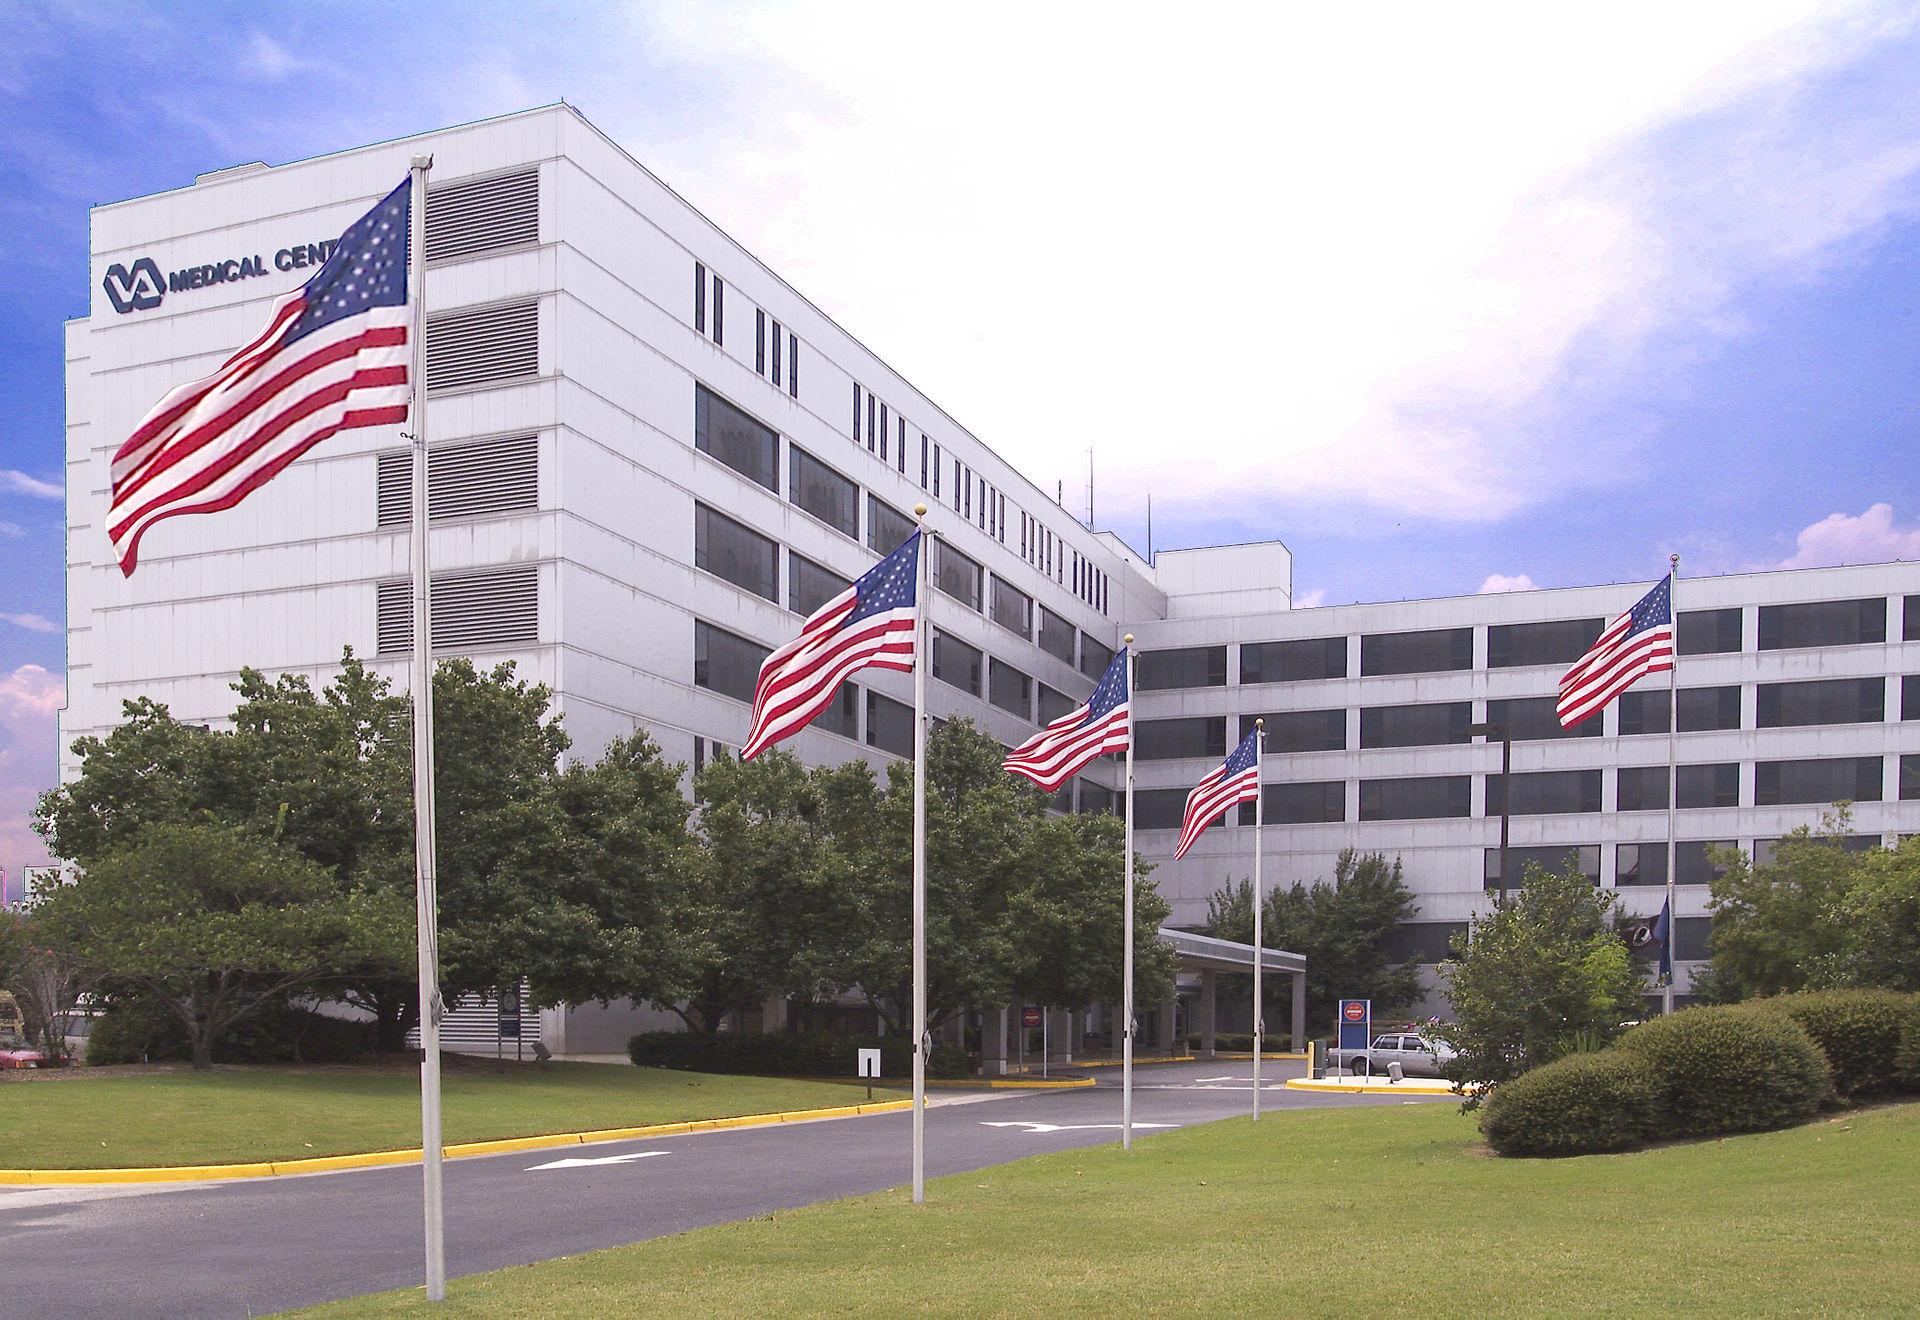 Norwood VA Medical Center